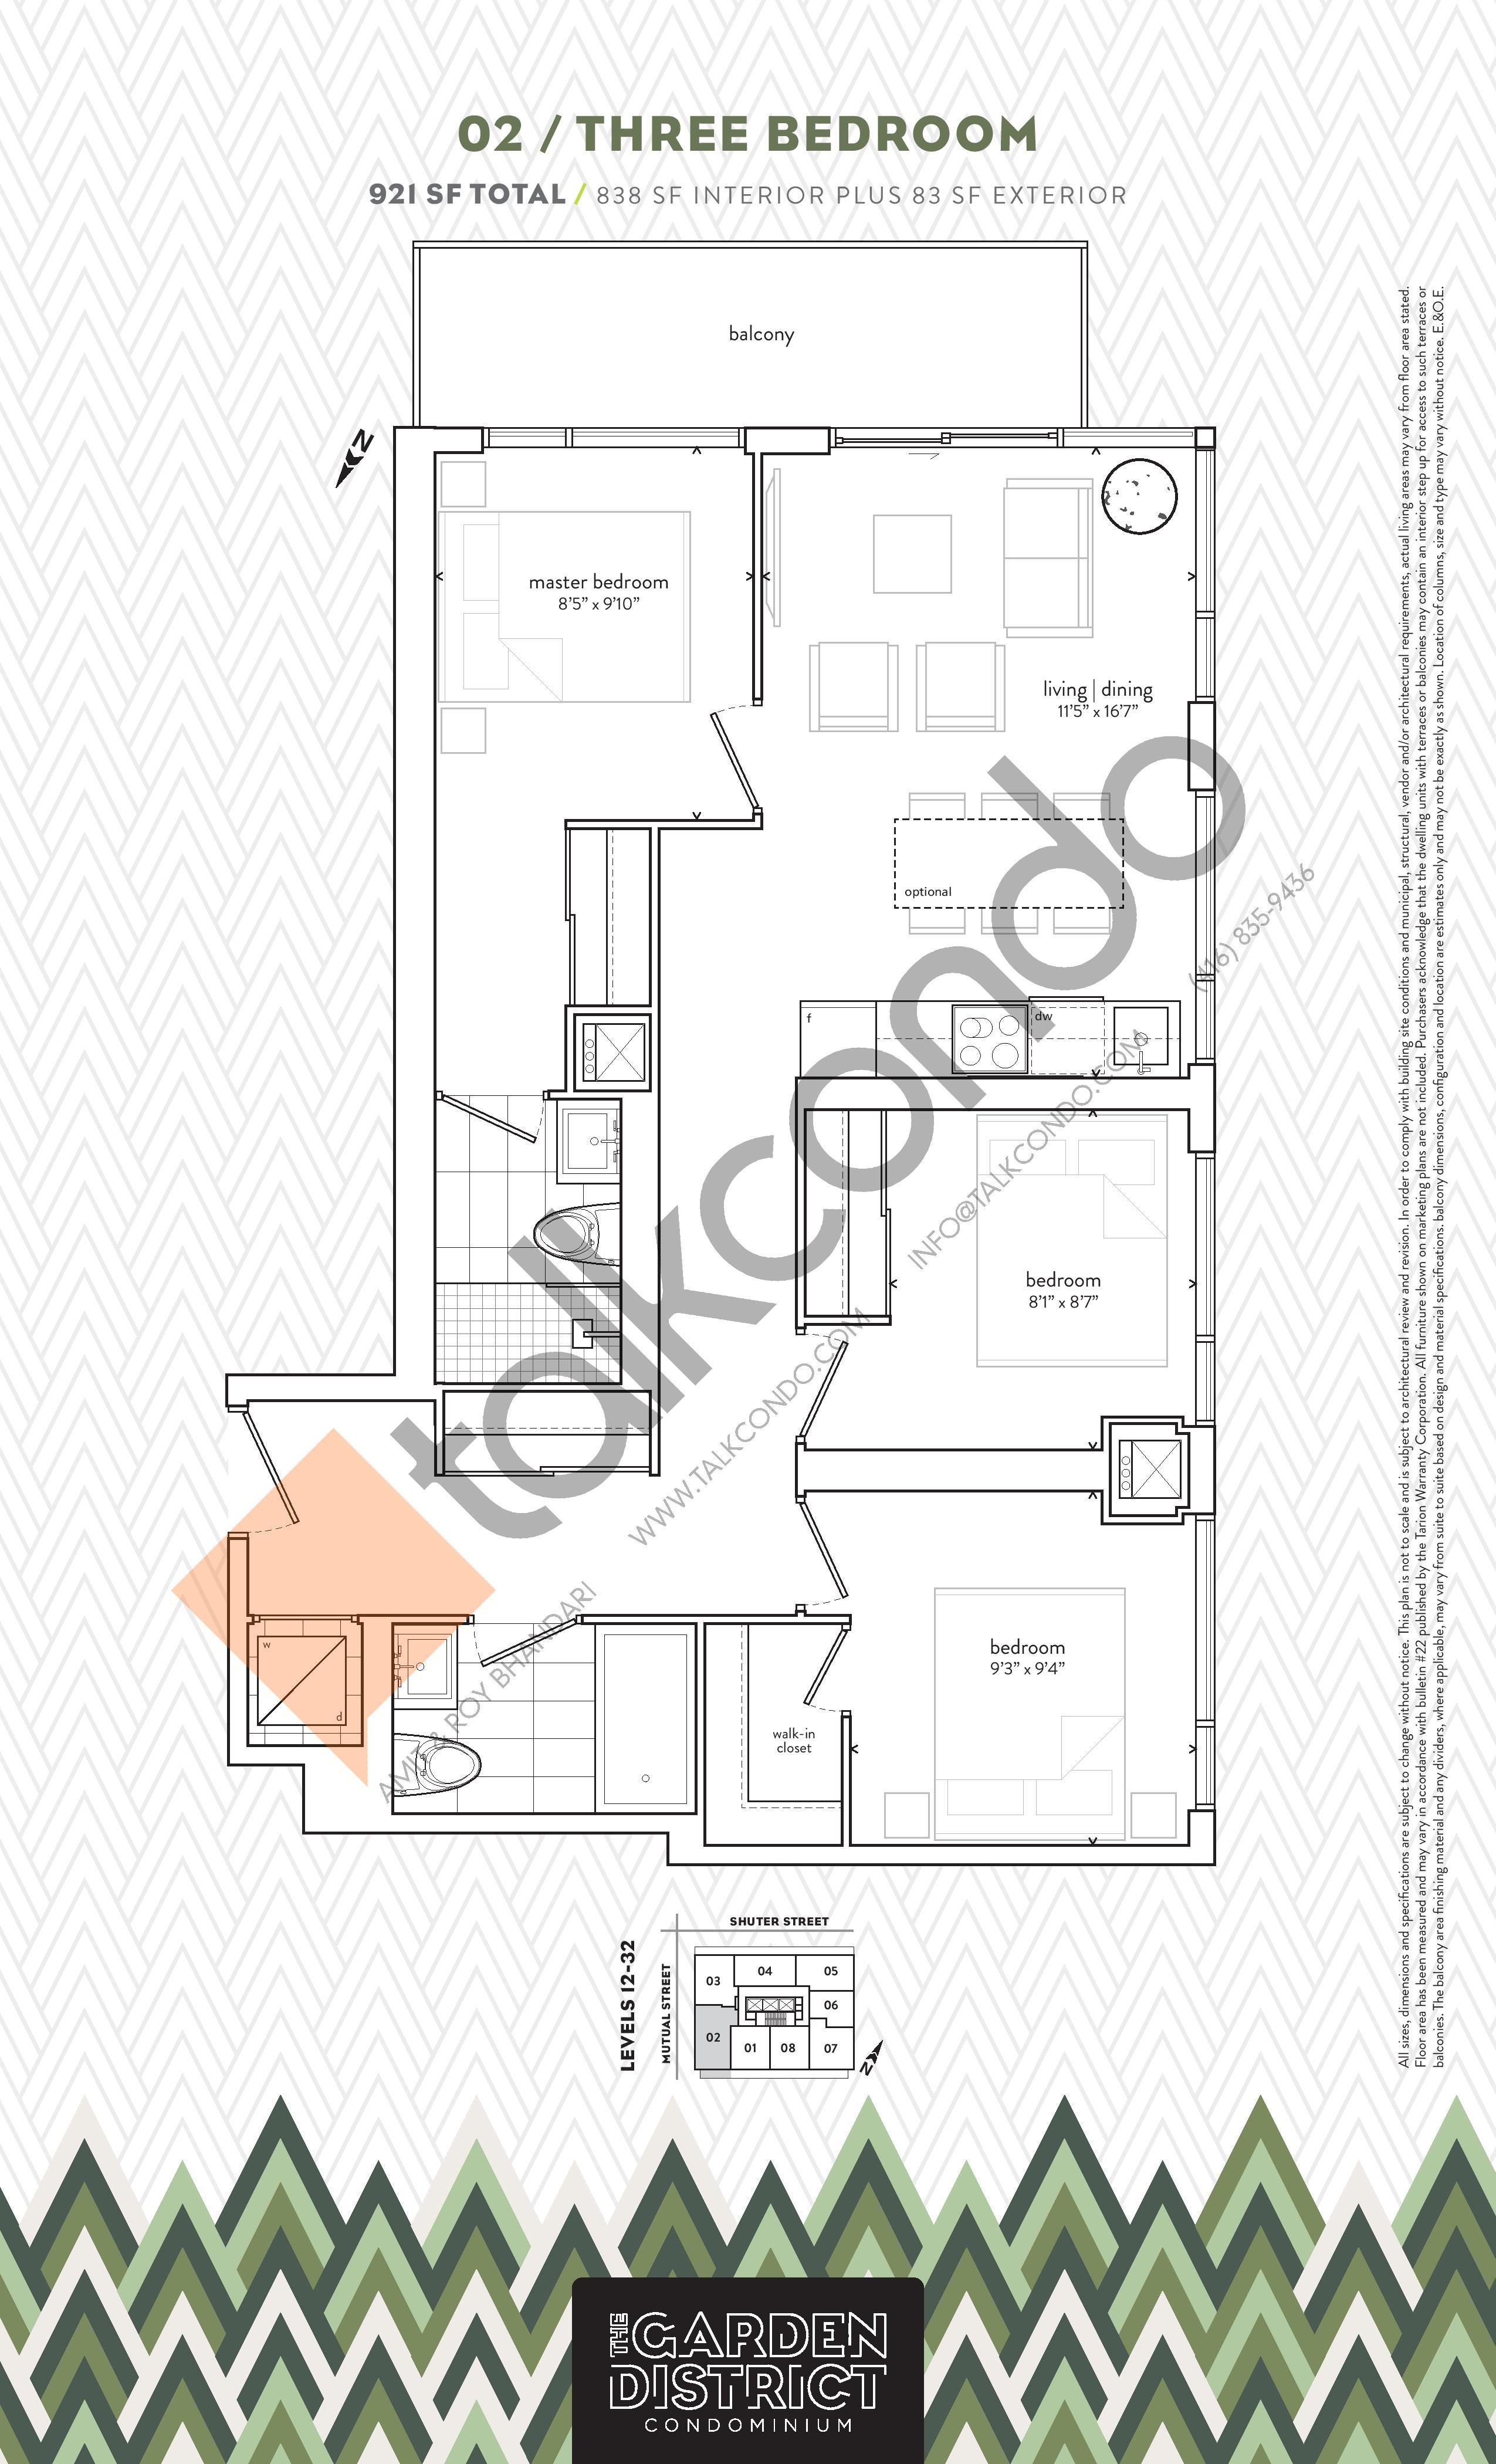 02 Floor Plan at Garden District Condos - 838 sq.ft